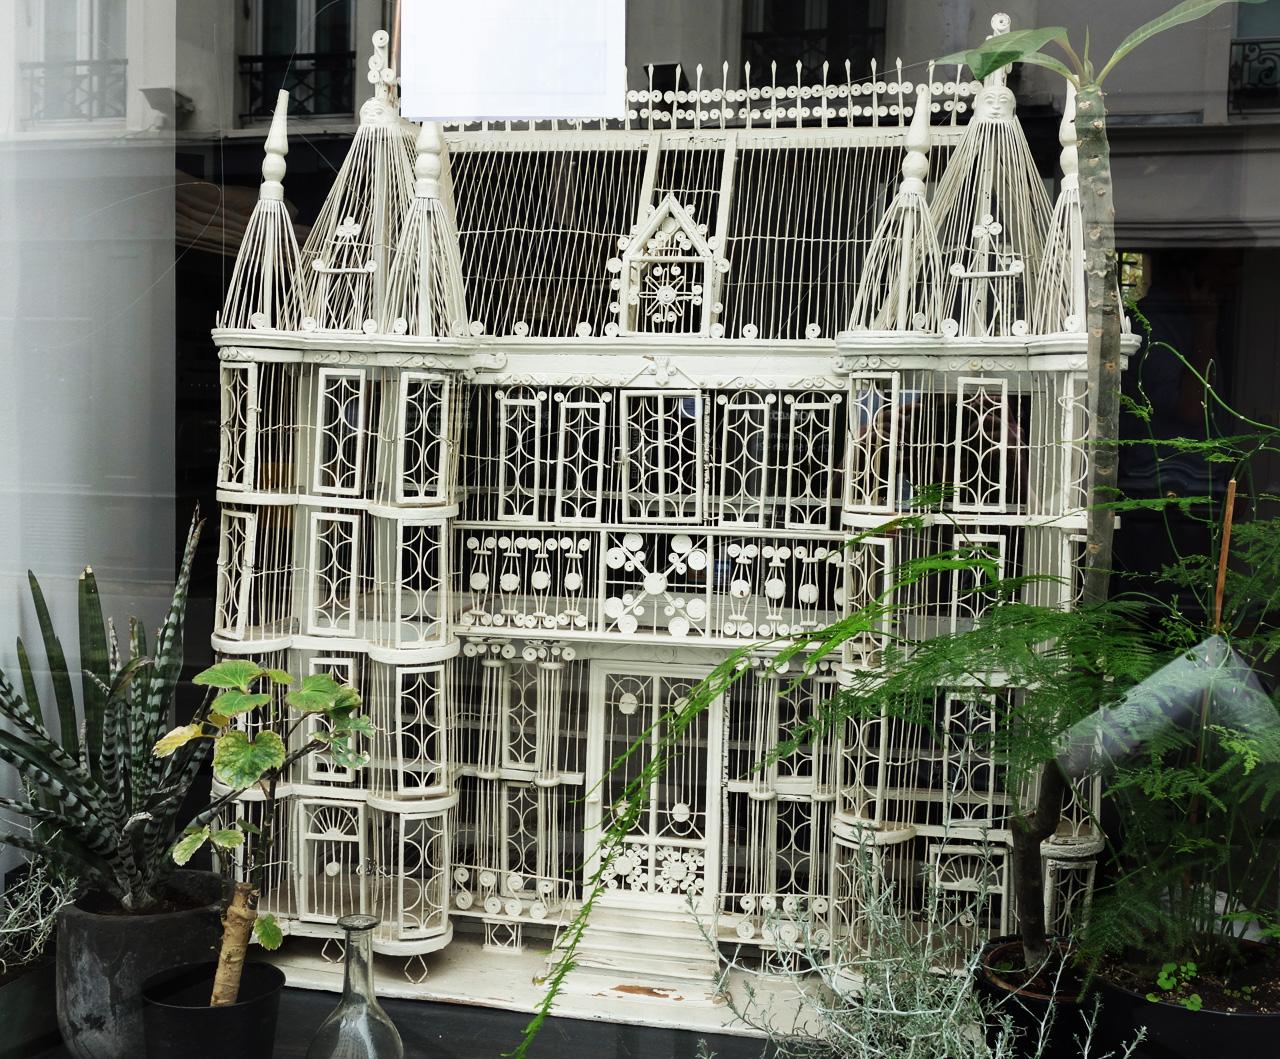 David-Gaillard-Les-Curieuses-boutique-vitrine-cage-ancienne